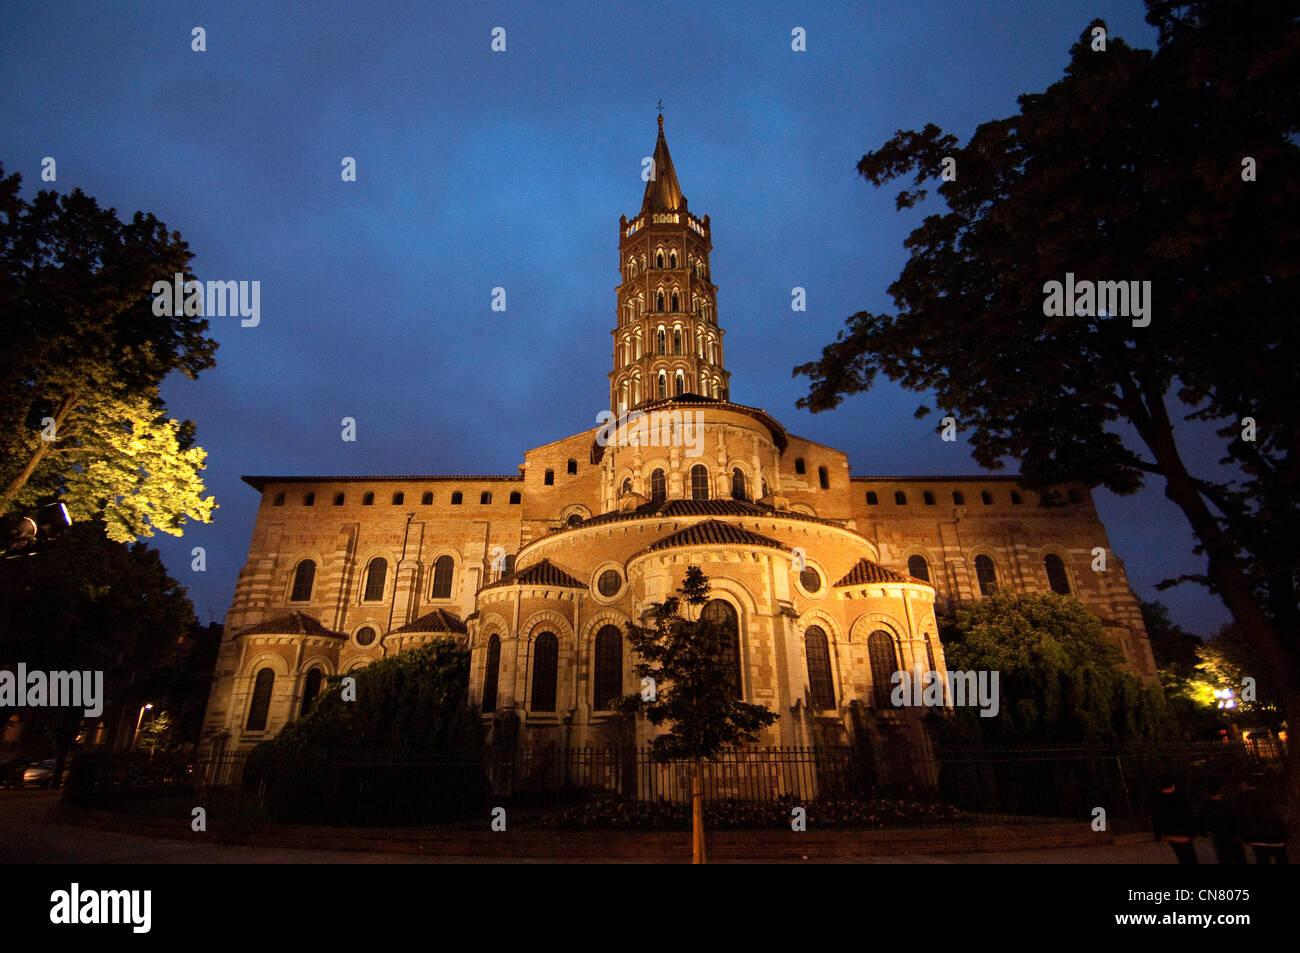 France, Haute Garonne, Toulouse, stop on el Camino de Santiago, cathedral Saint Sernin (or Saint Saturnin) dated - Stock Image